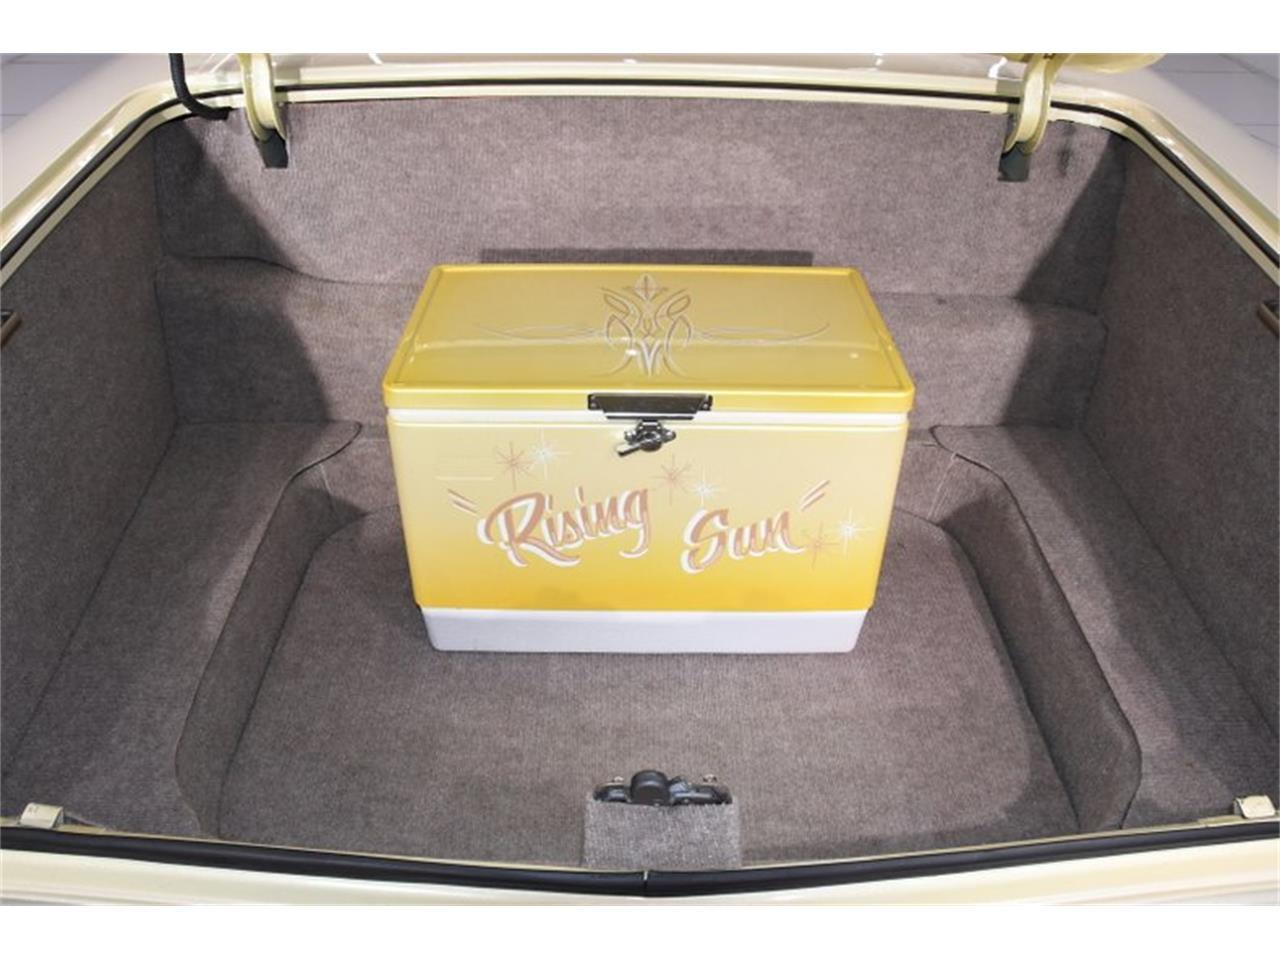 Large Picture of Classic '62 Chevrolet Impala located in Illinois - $51,998.00 - QIVA